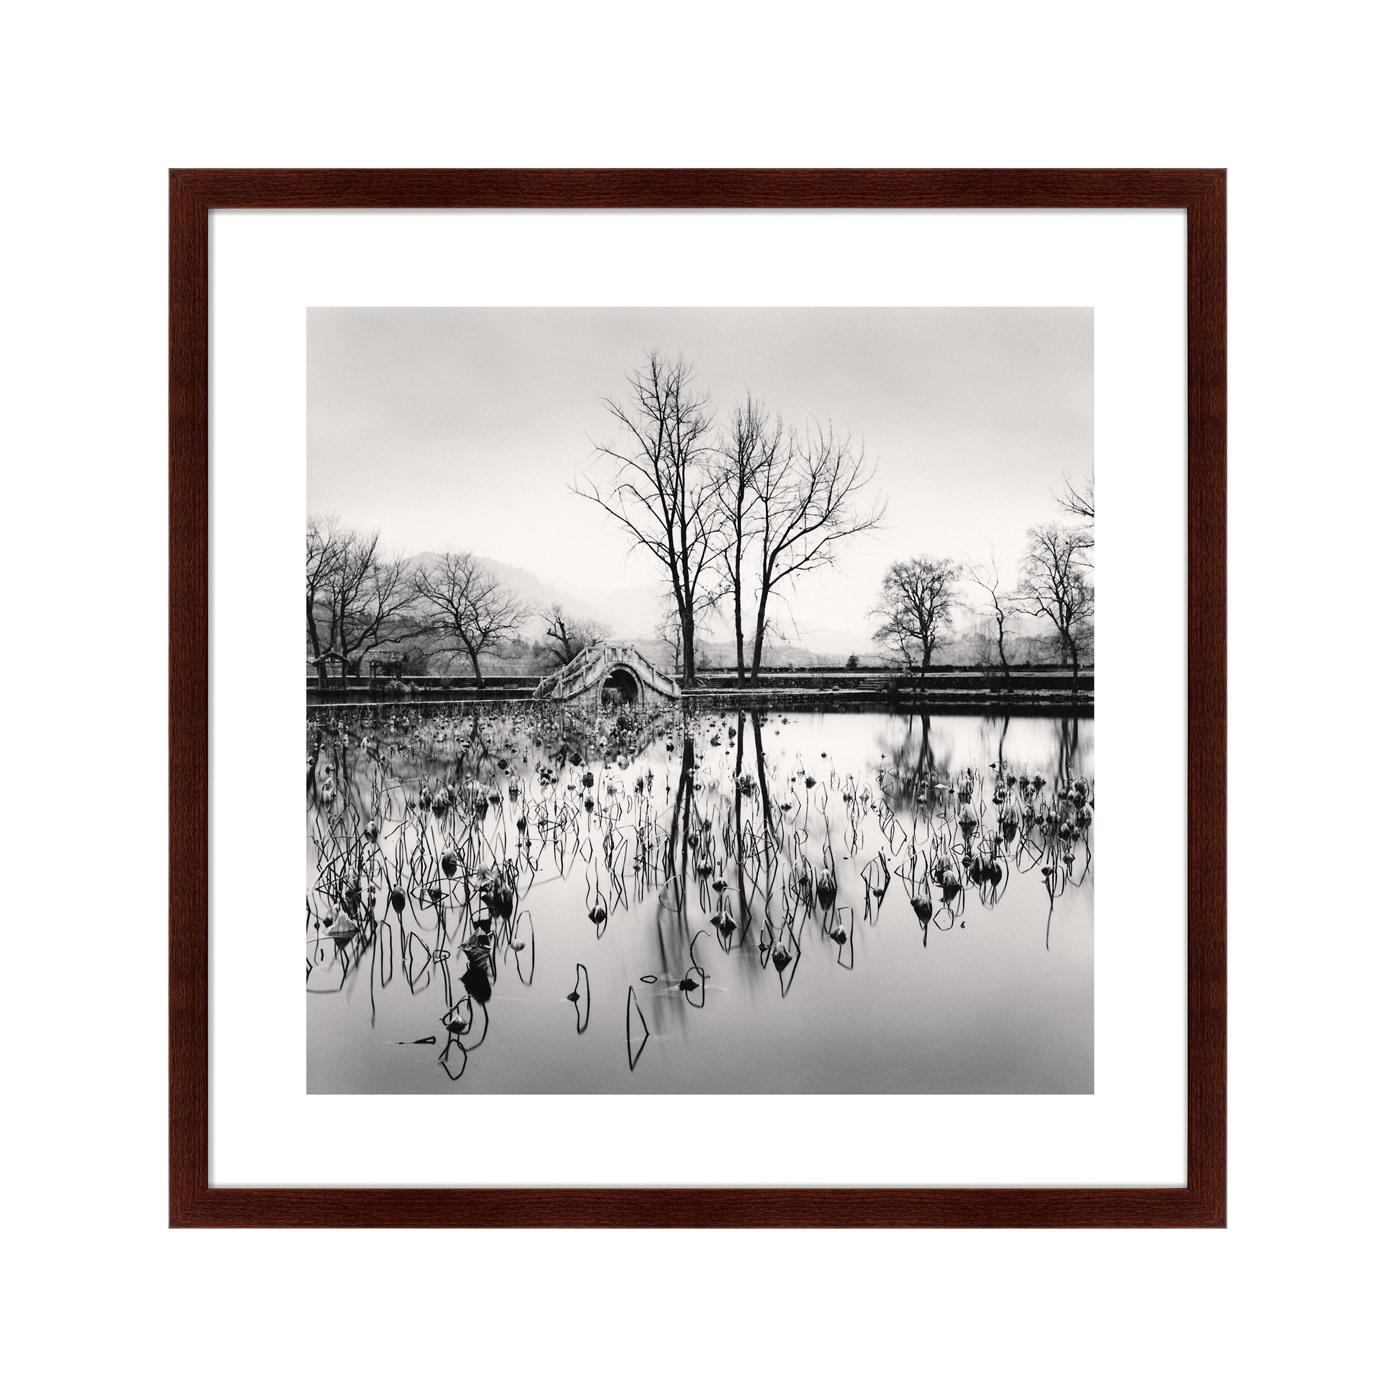 {} Картины в Квартиру Картина Lake Bridge Hongkun (79х79 см) картины в квартиру картина etude 2 102х130 см